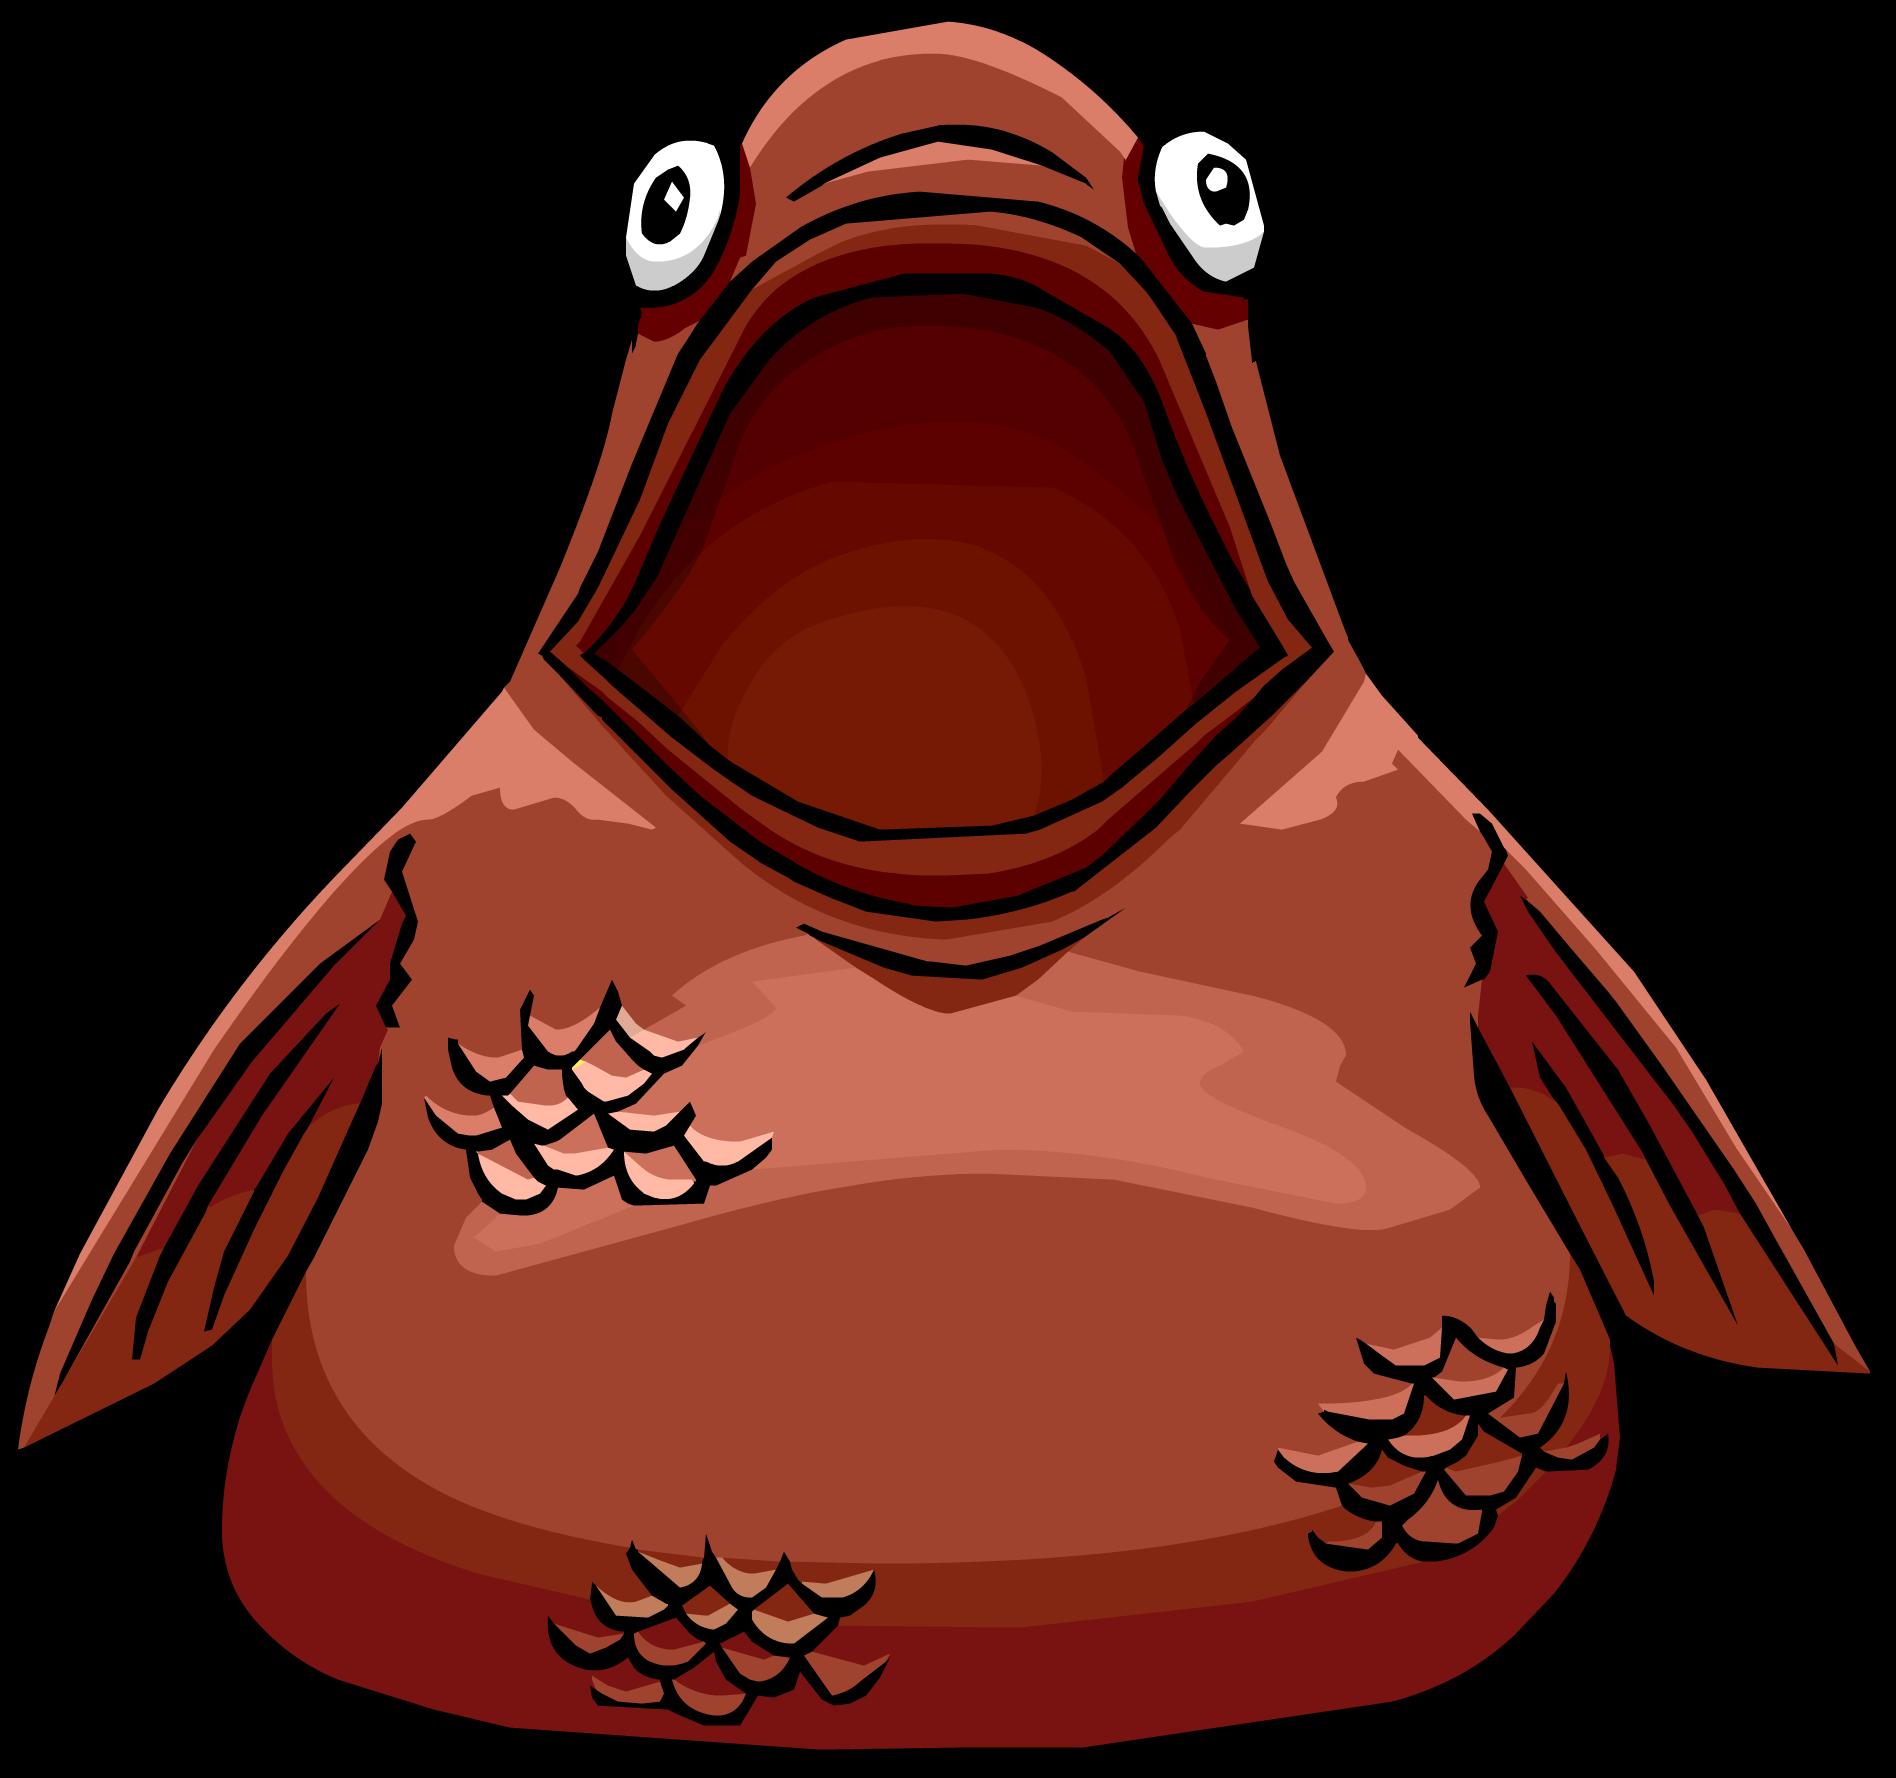 Walrus clipart arctic fish. Wise costume club penguin